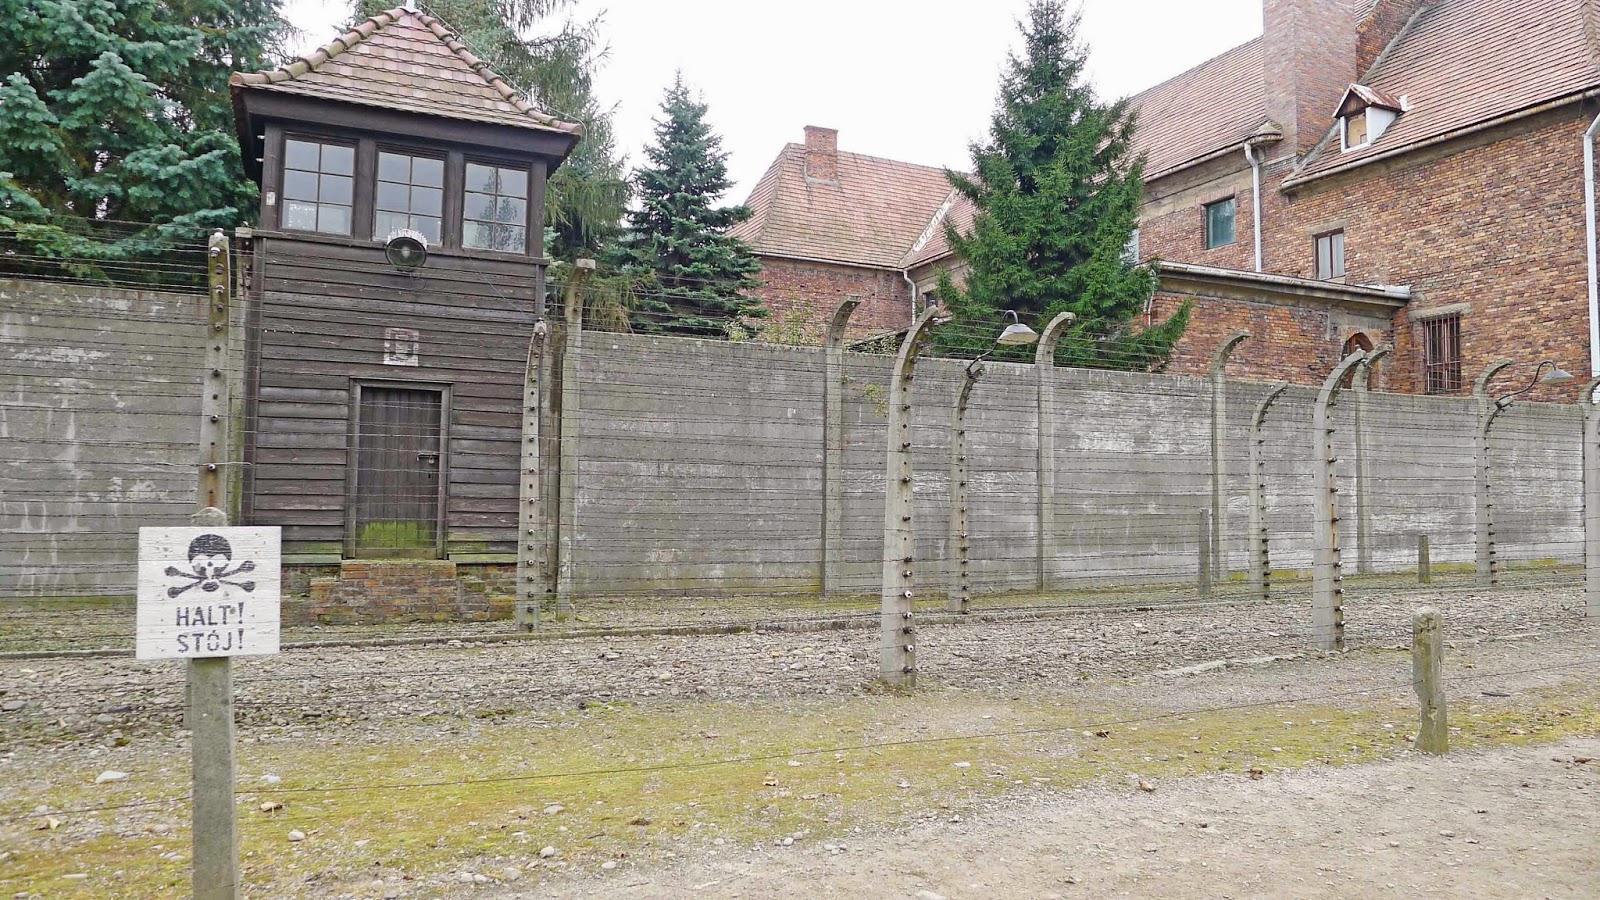 Auschwitz Tower and Barbed Wire Gates